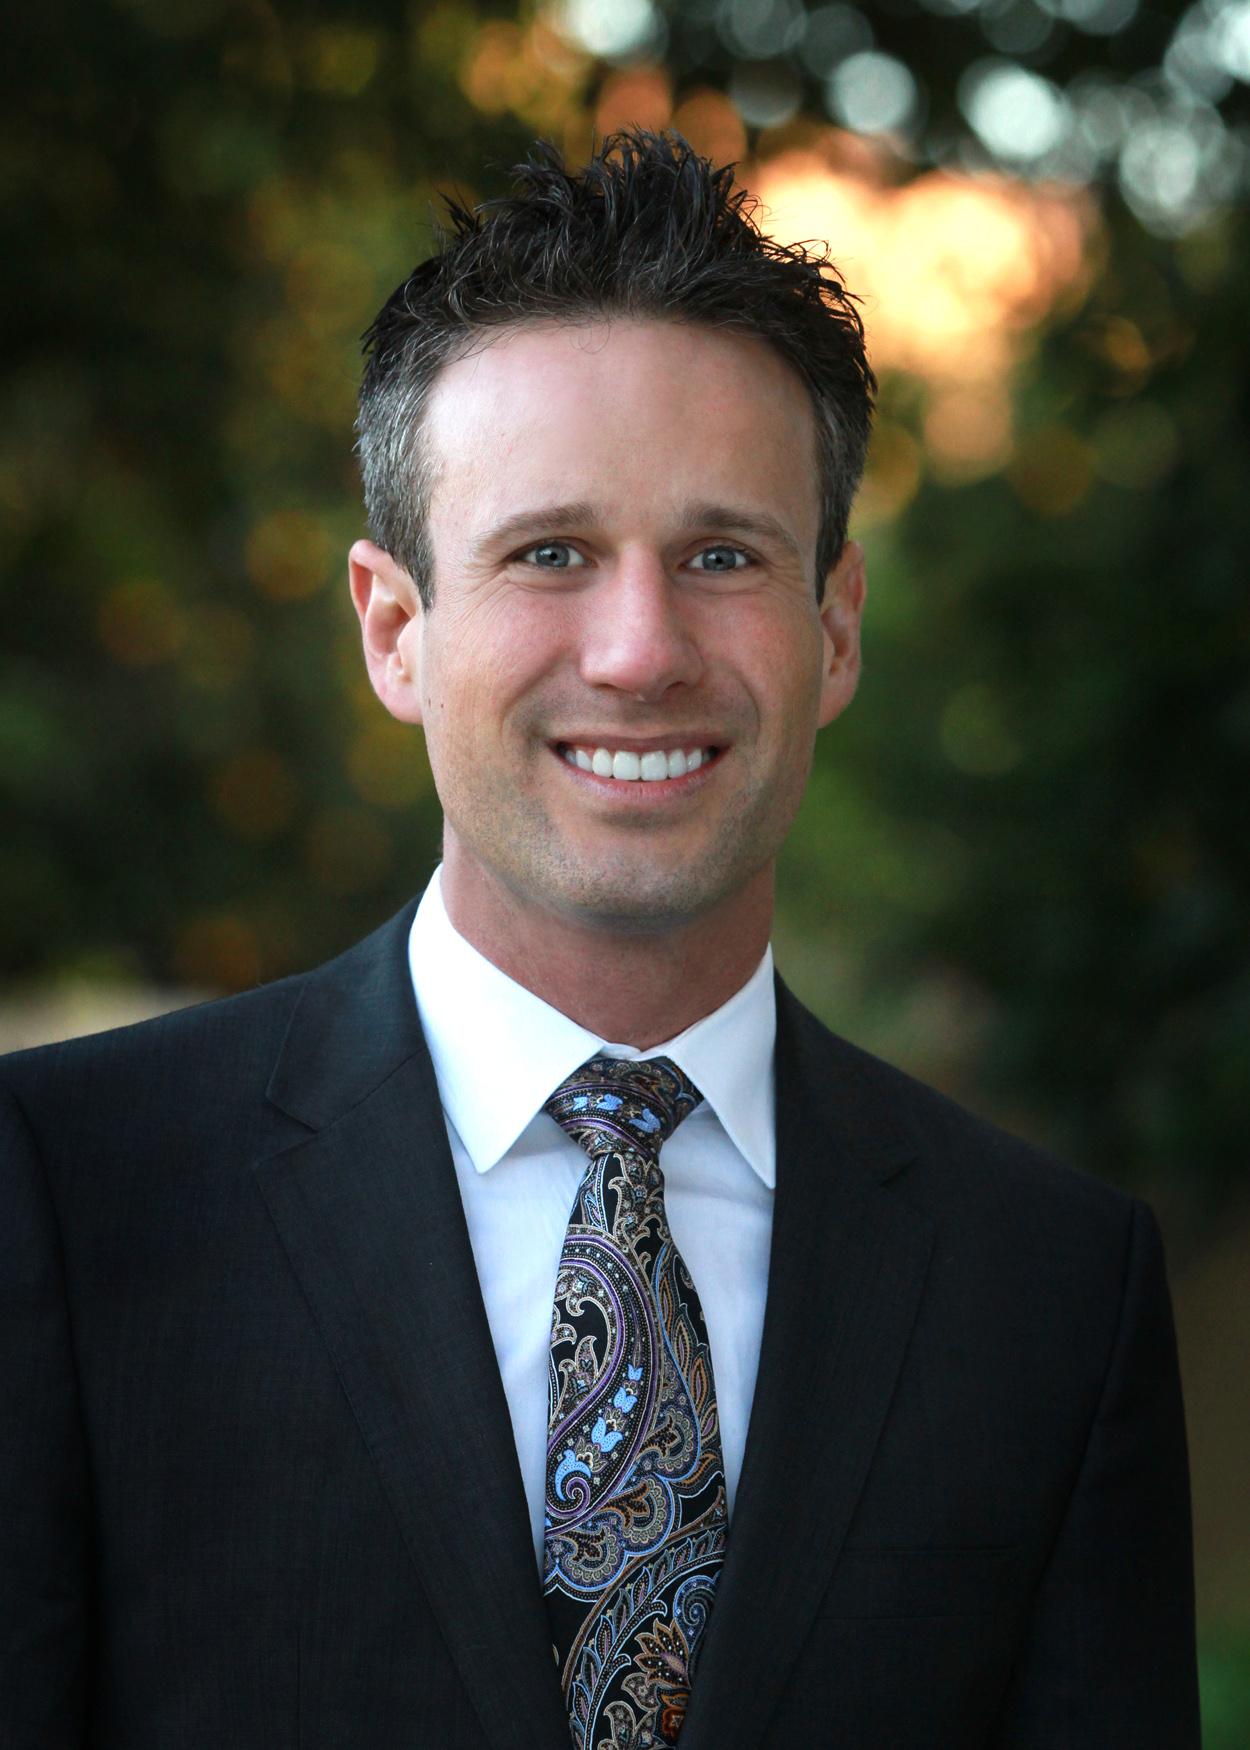 Dr. David Gibbons